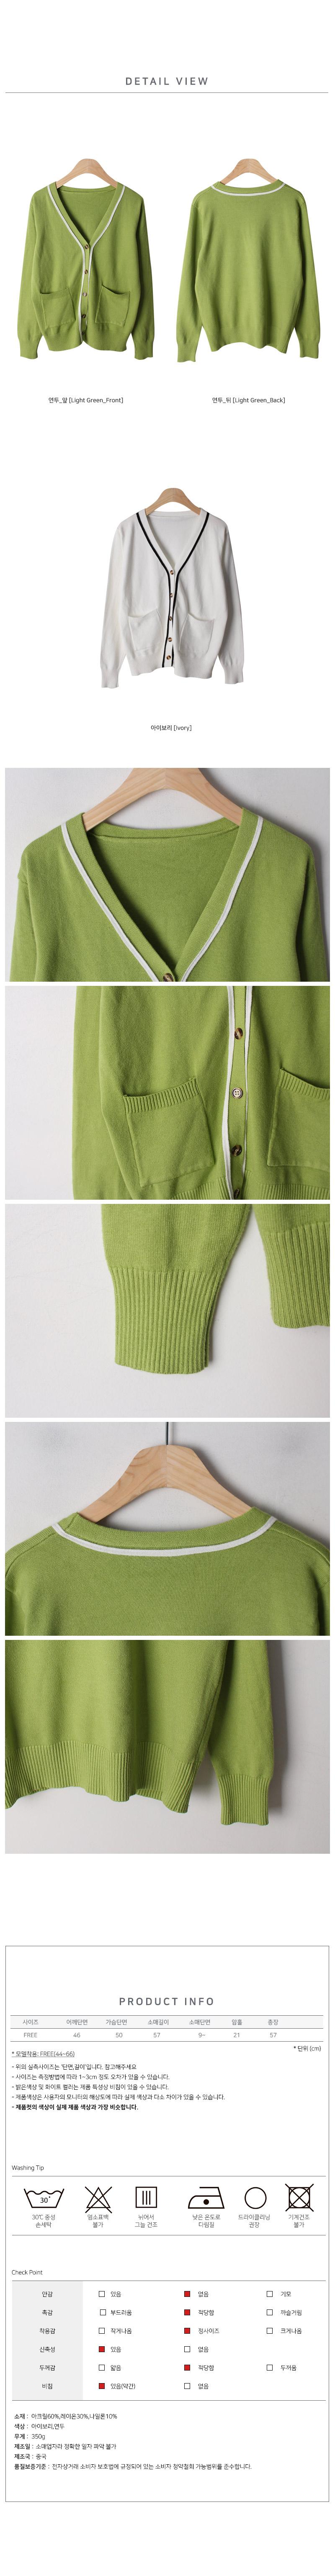 Green milk color cardigan